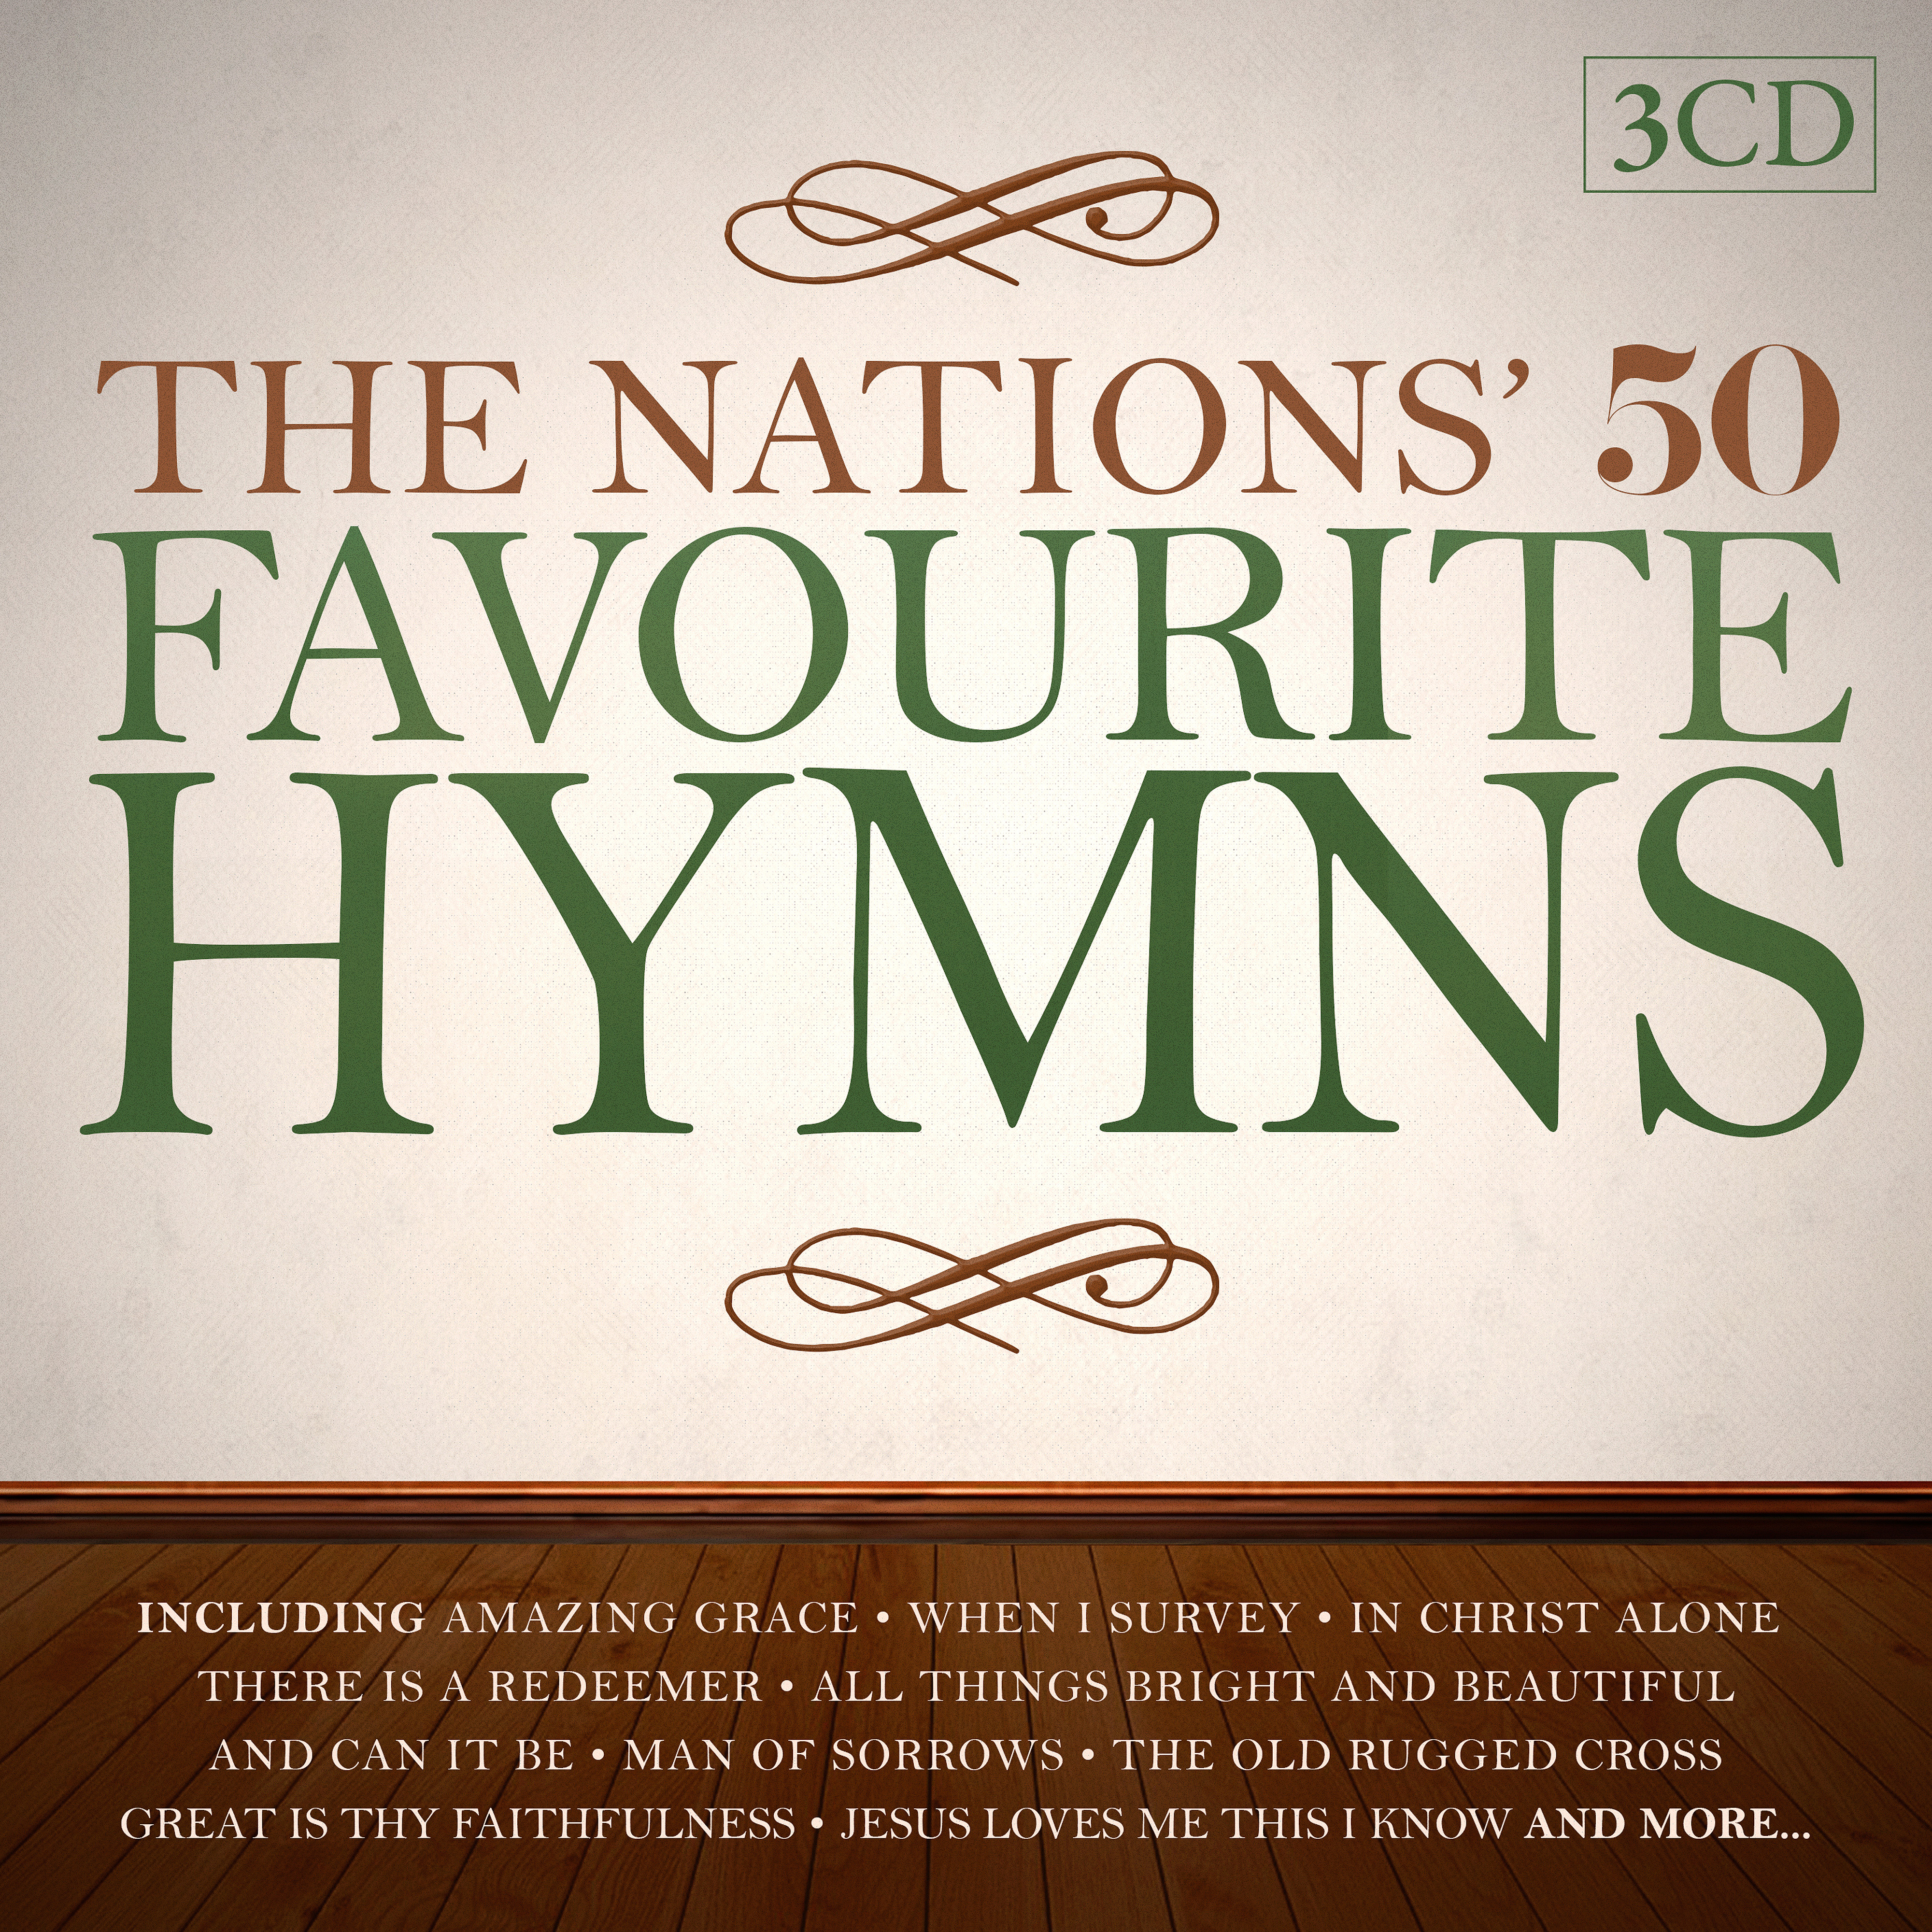 Greatest Hymns Music includes bonus track Christian & Gospel